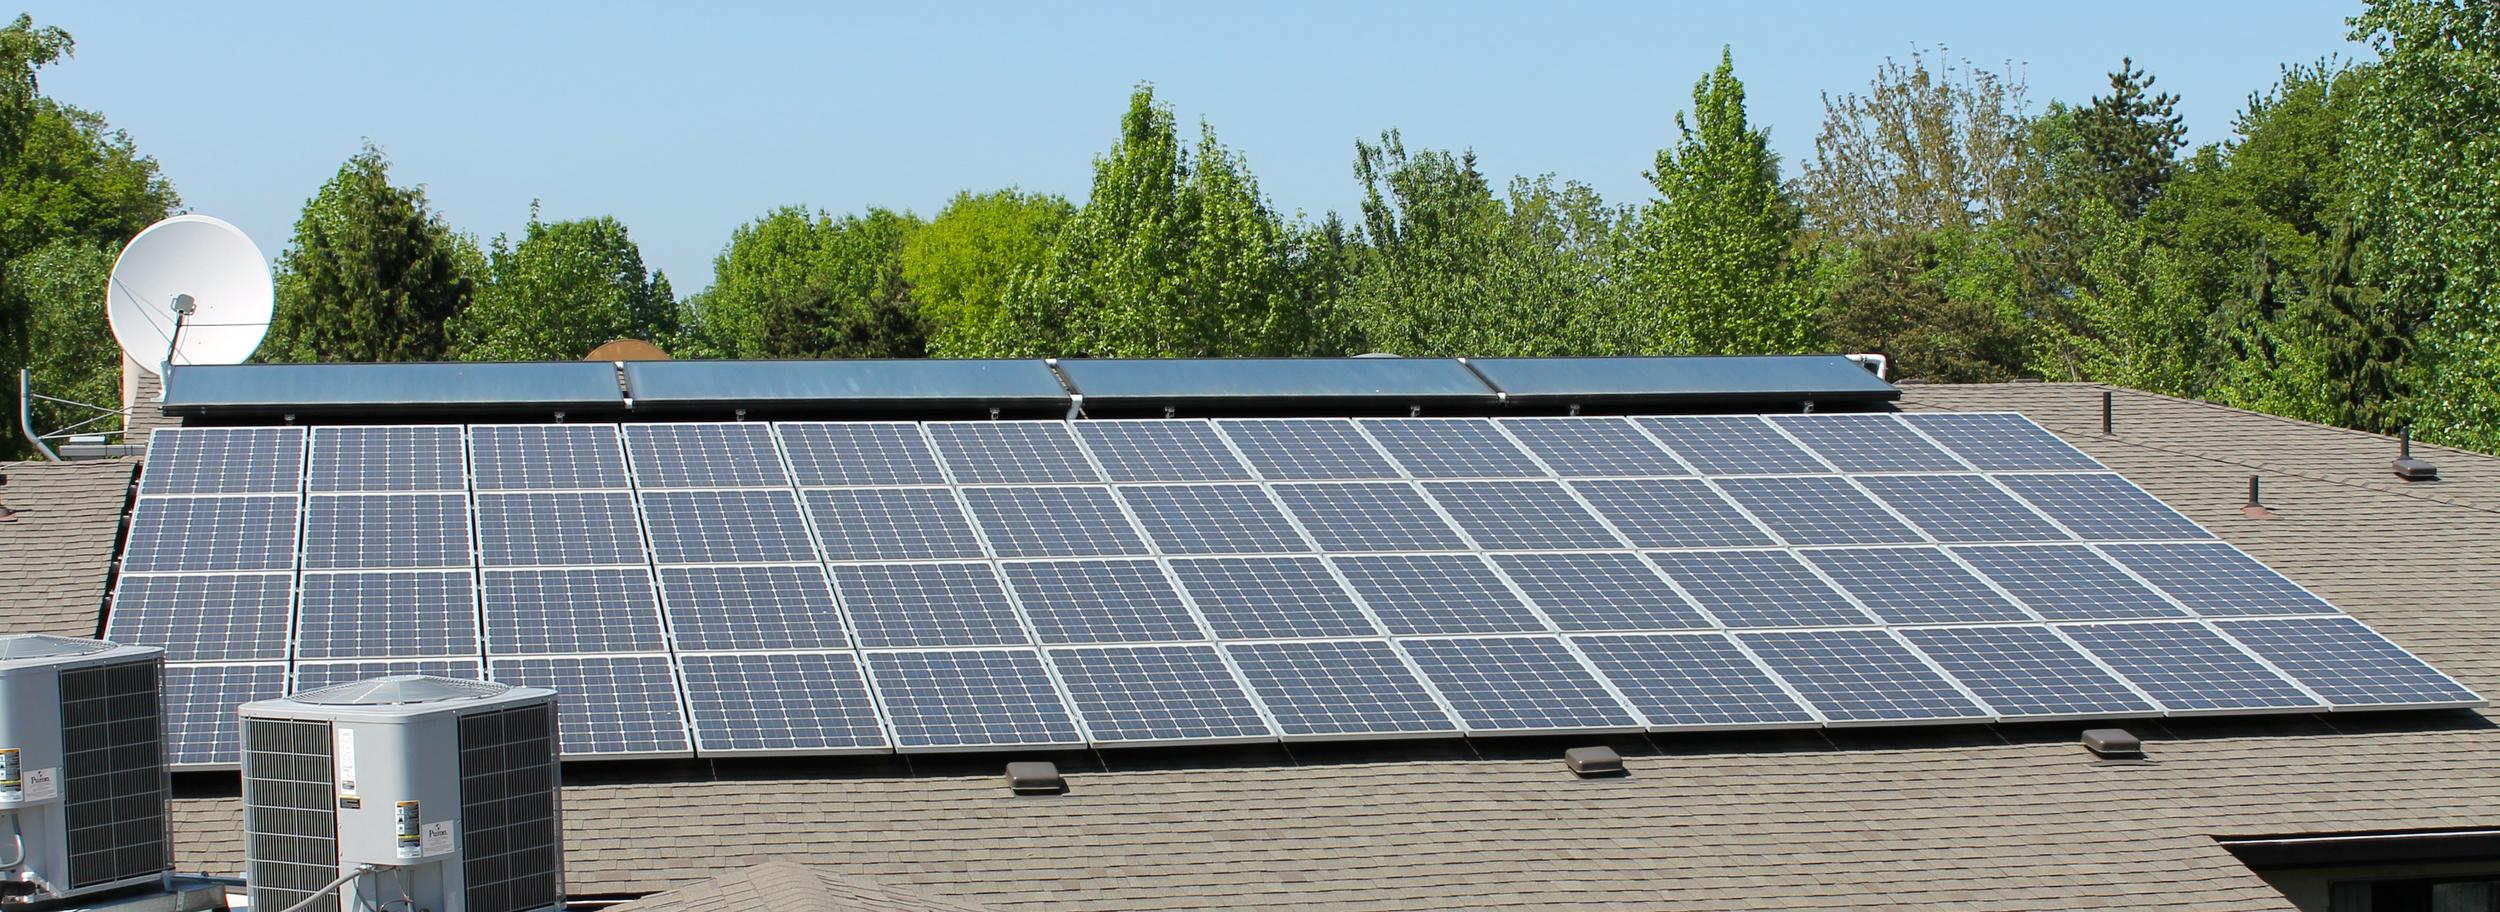 solar power 3.jpg